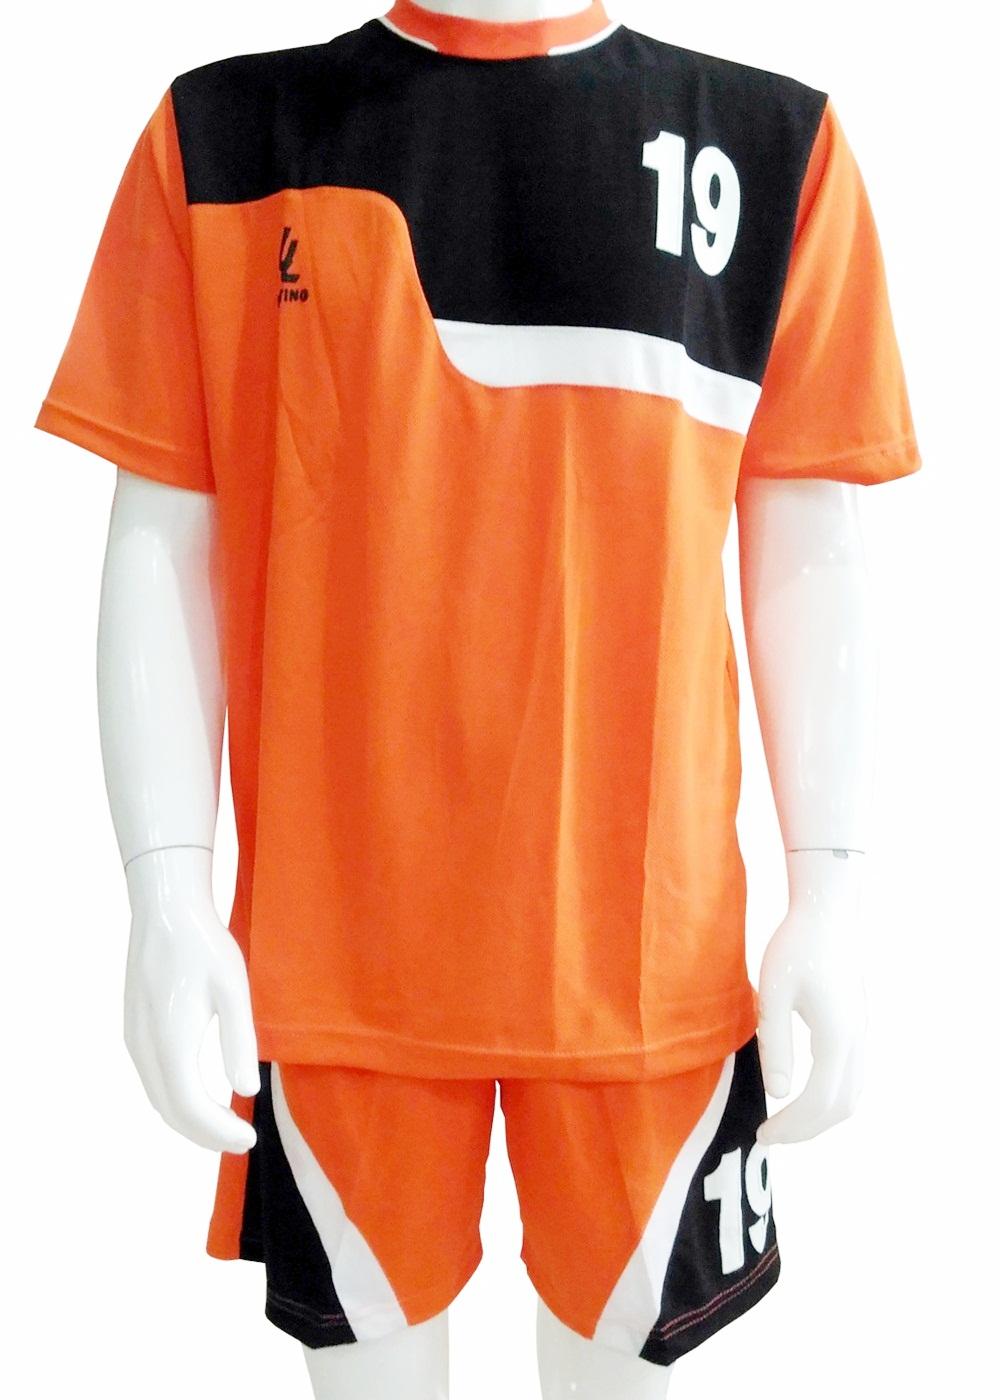 Produk Lifting Mencakup Beberapa Kategori Olahraga Seperti Apparel Celana Bola Futsal Basket Costa